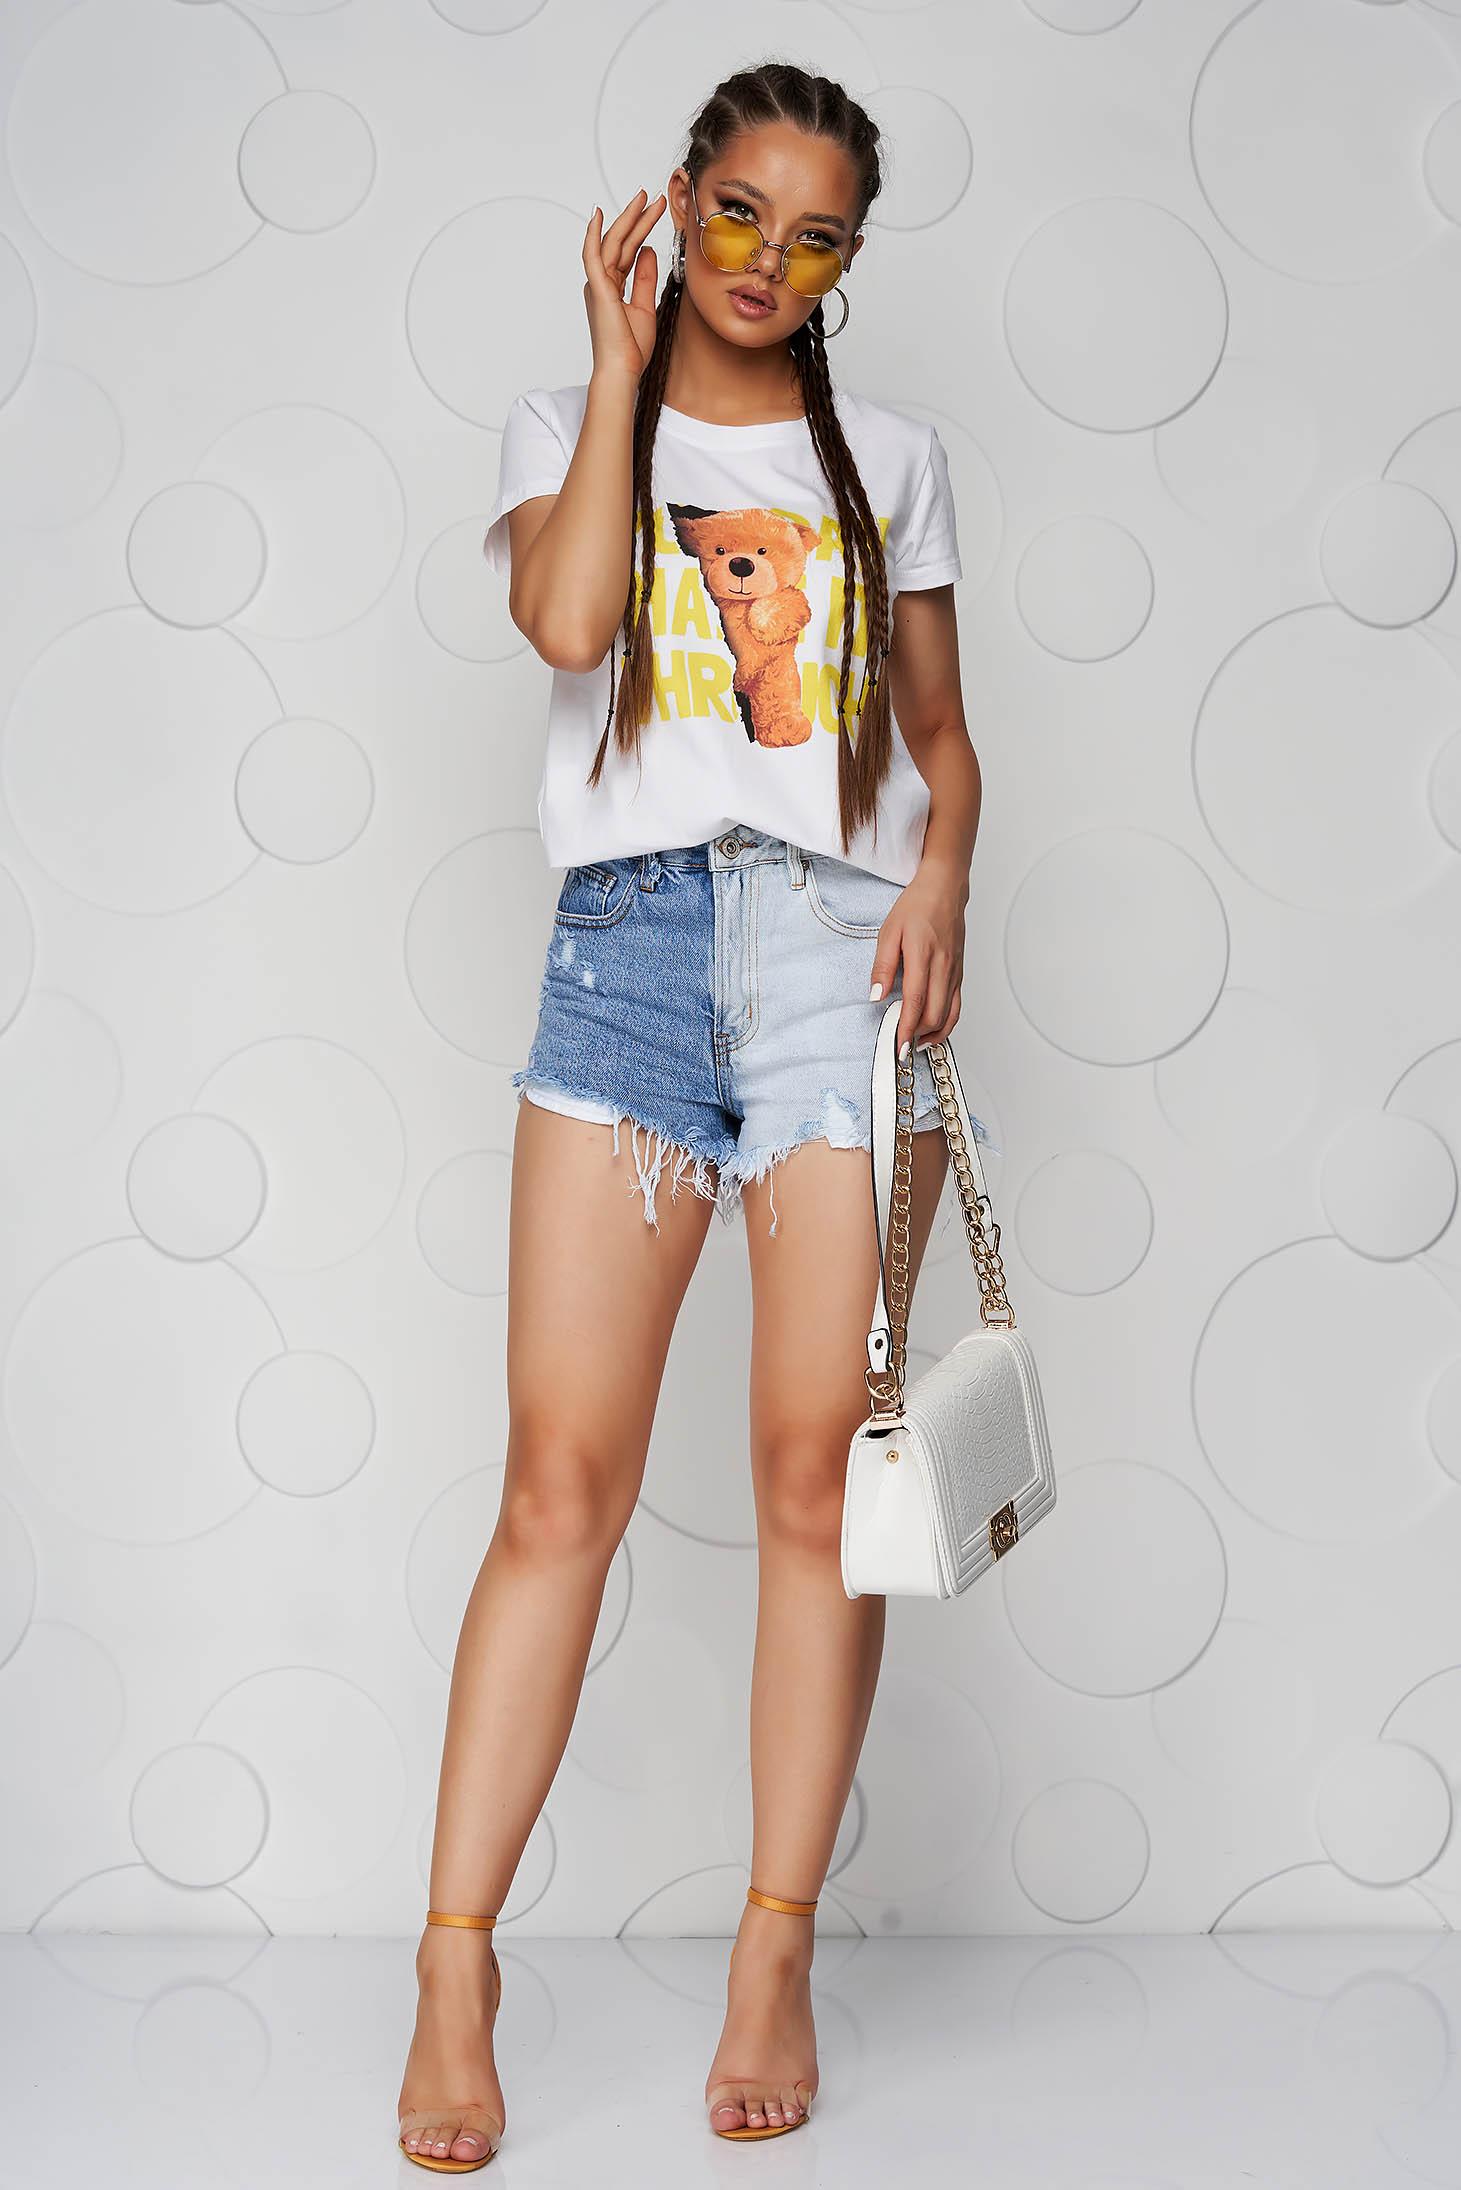 Pantaloni scurti SunShine de blugi cu talie inalta mulati cu mici rupturi de material in doua culori